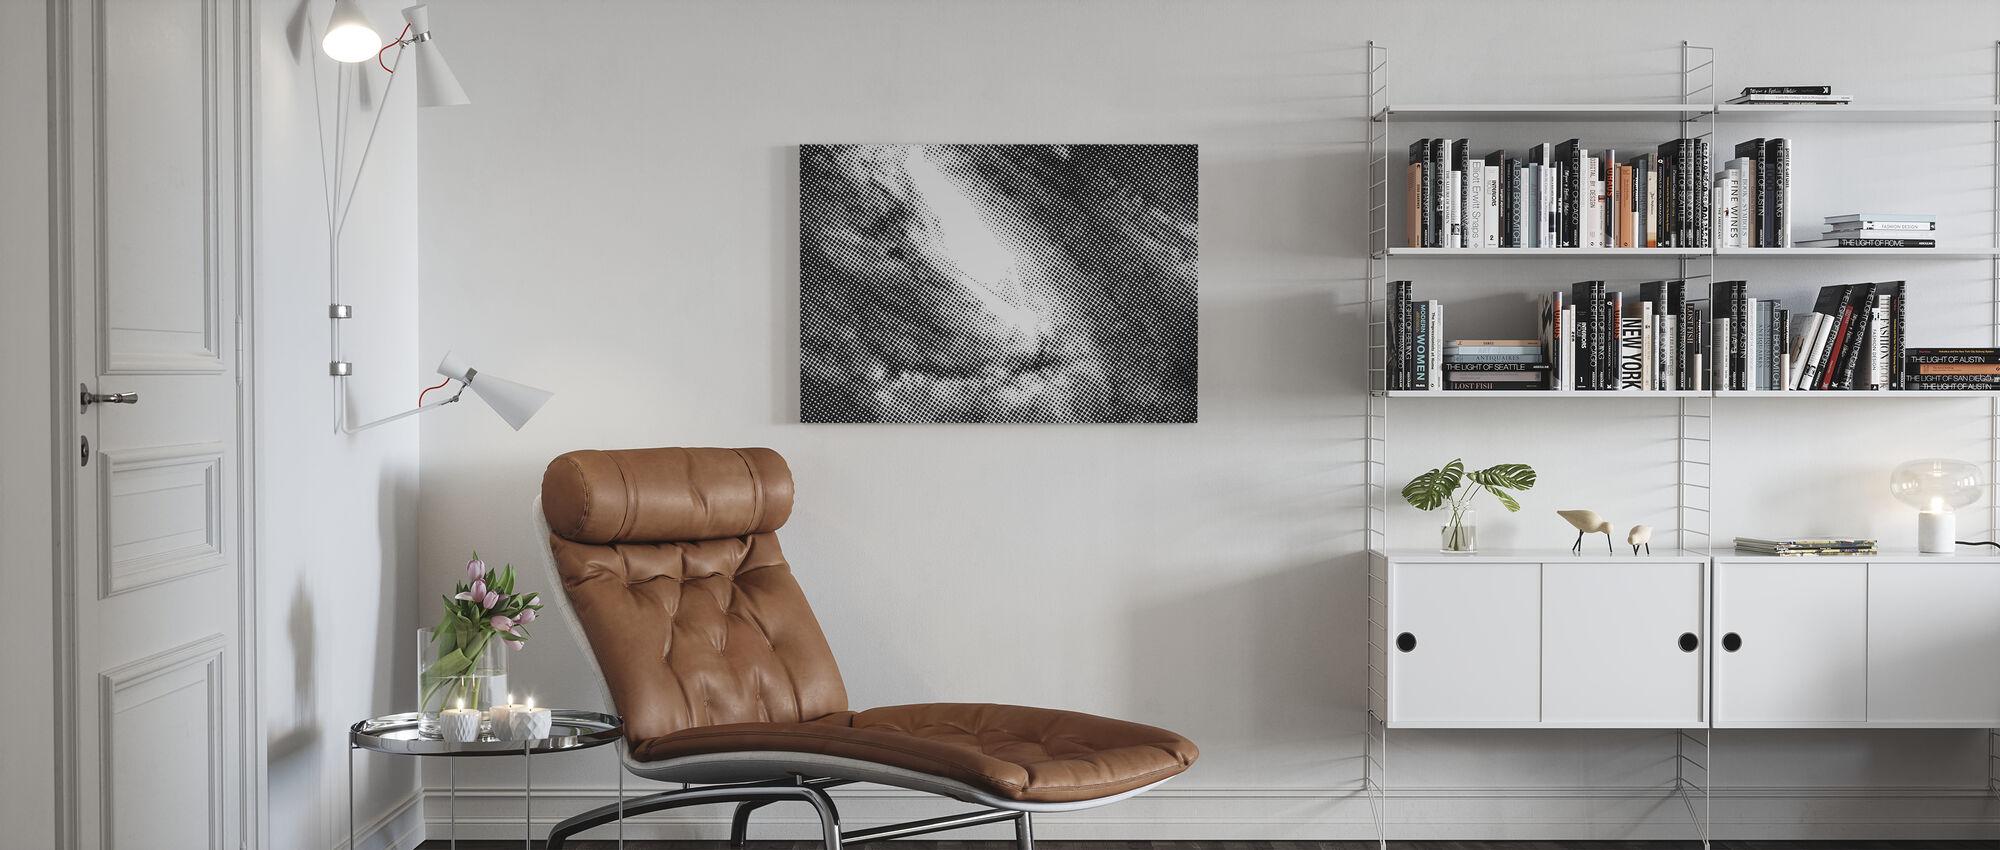 Laatste Frontier Galaxy Twee - Canvas print - Woonkamer